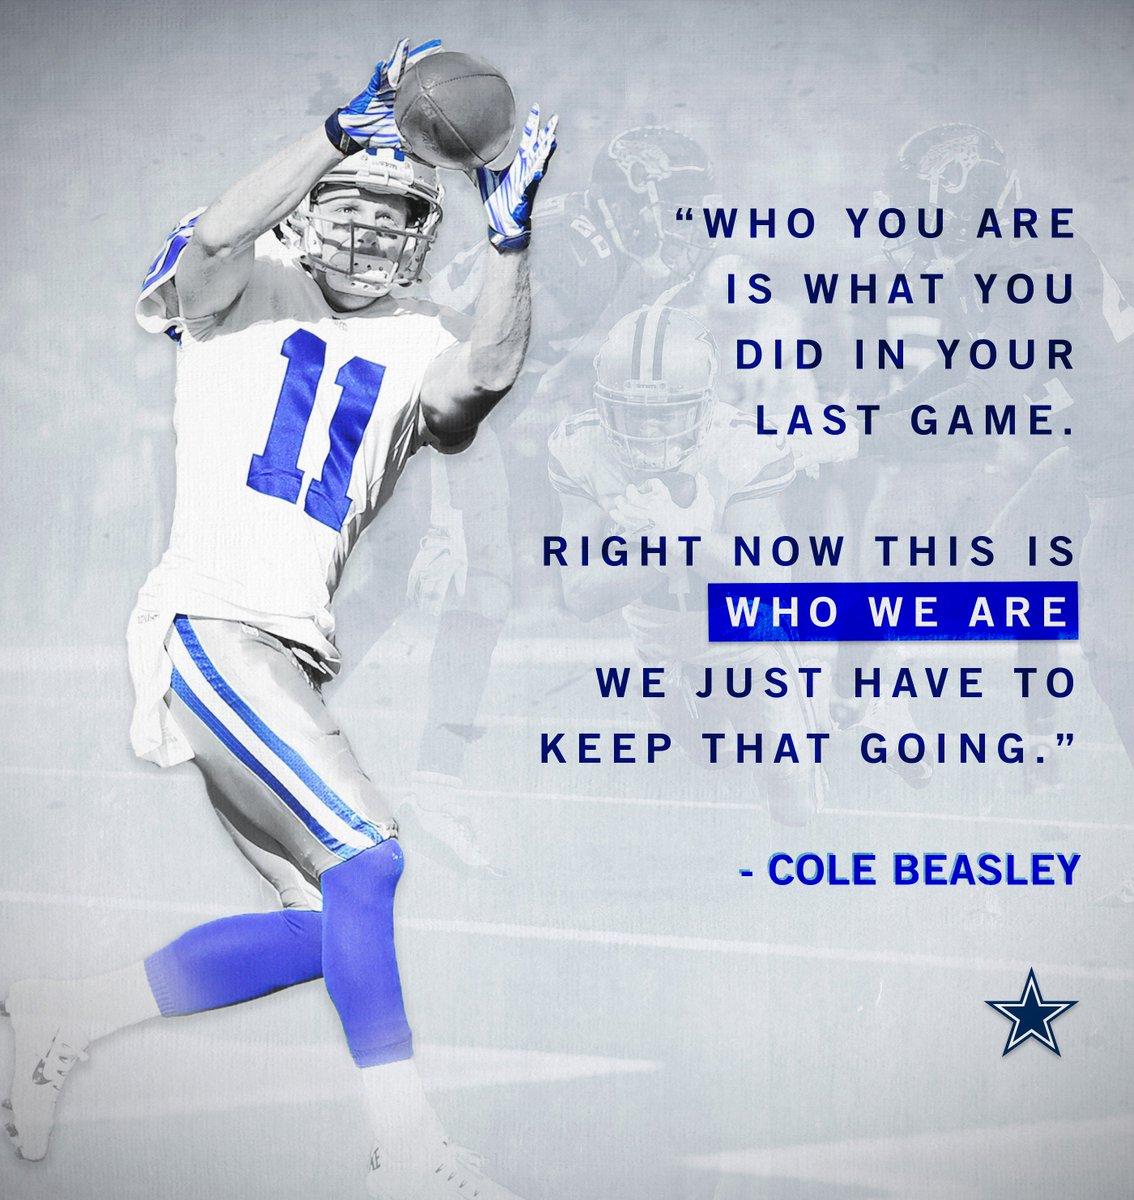 KEEP. IT. GOING.  @Bease11 | #DallasCowboys <br>http://pic.twitter.com/jiSx8527vw